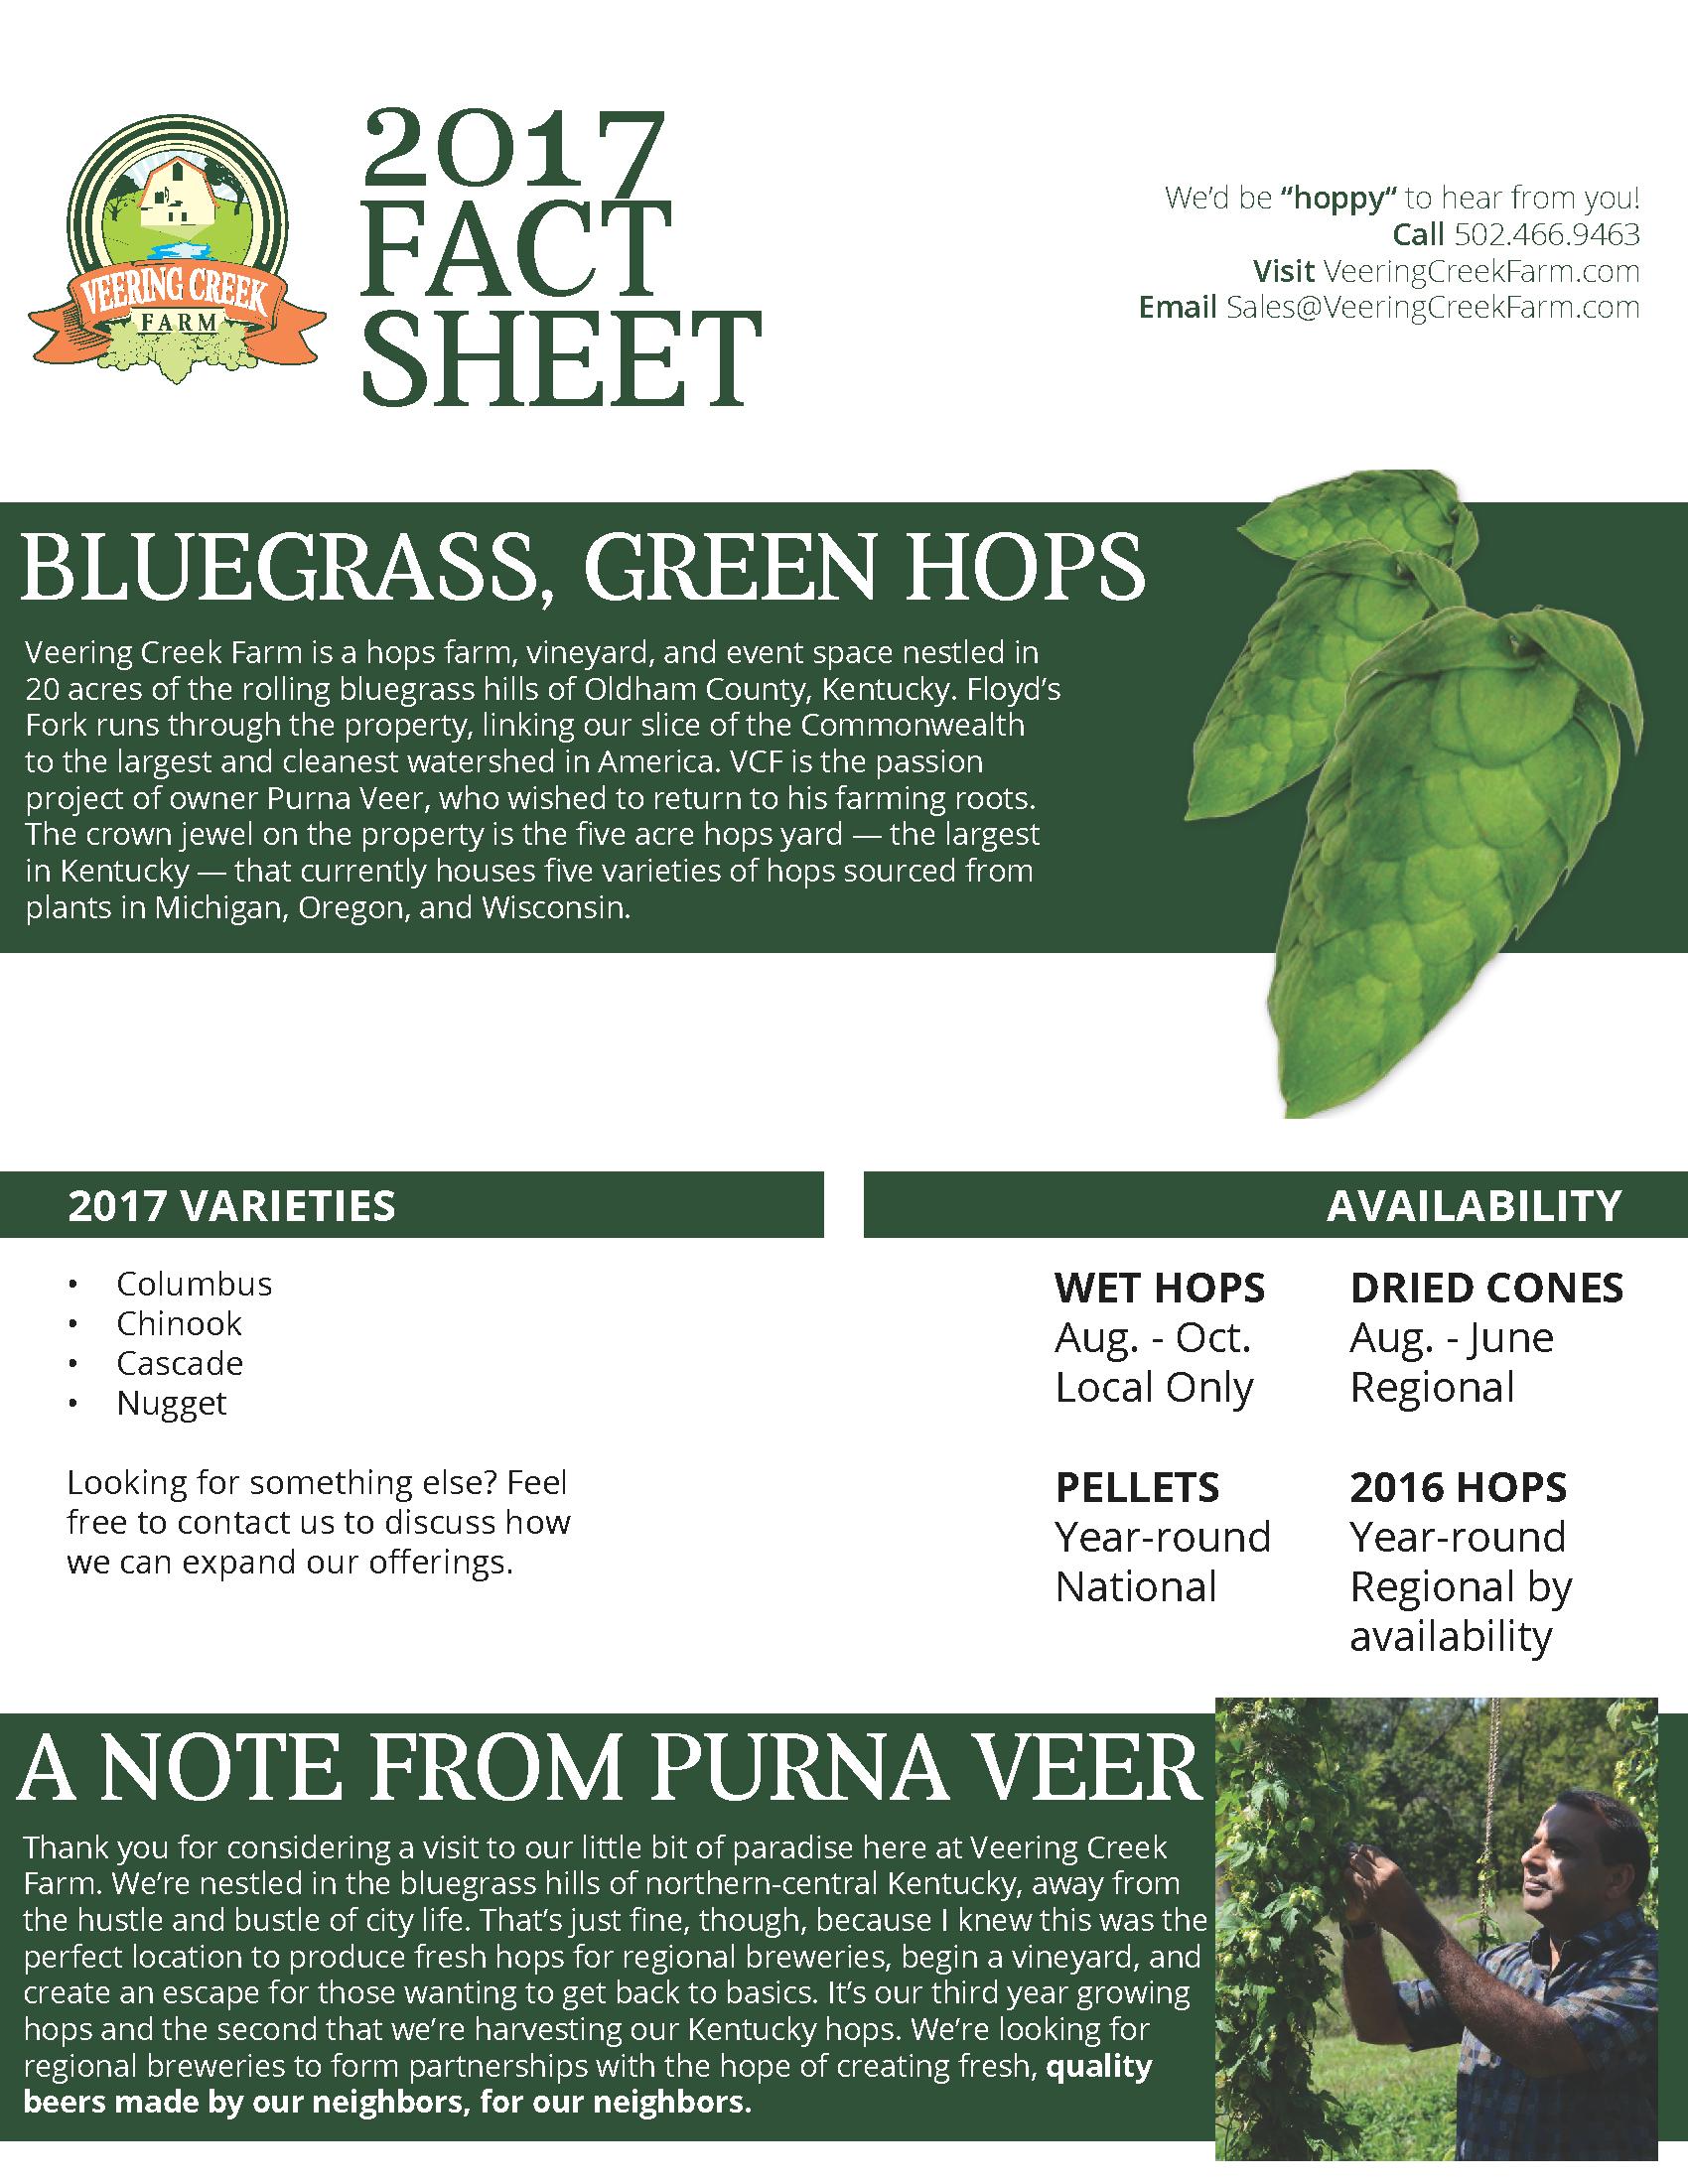 Veering Creek Farm Fact Sheet